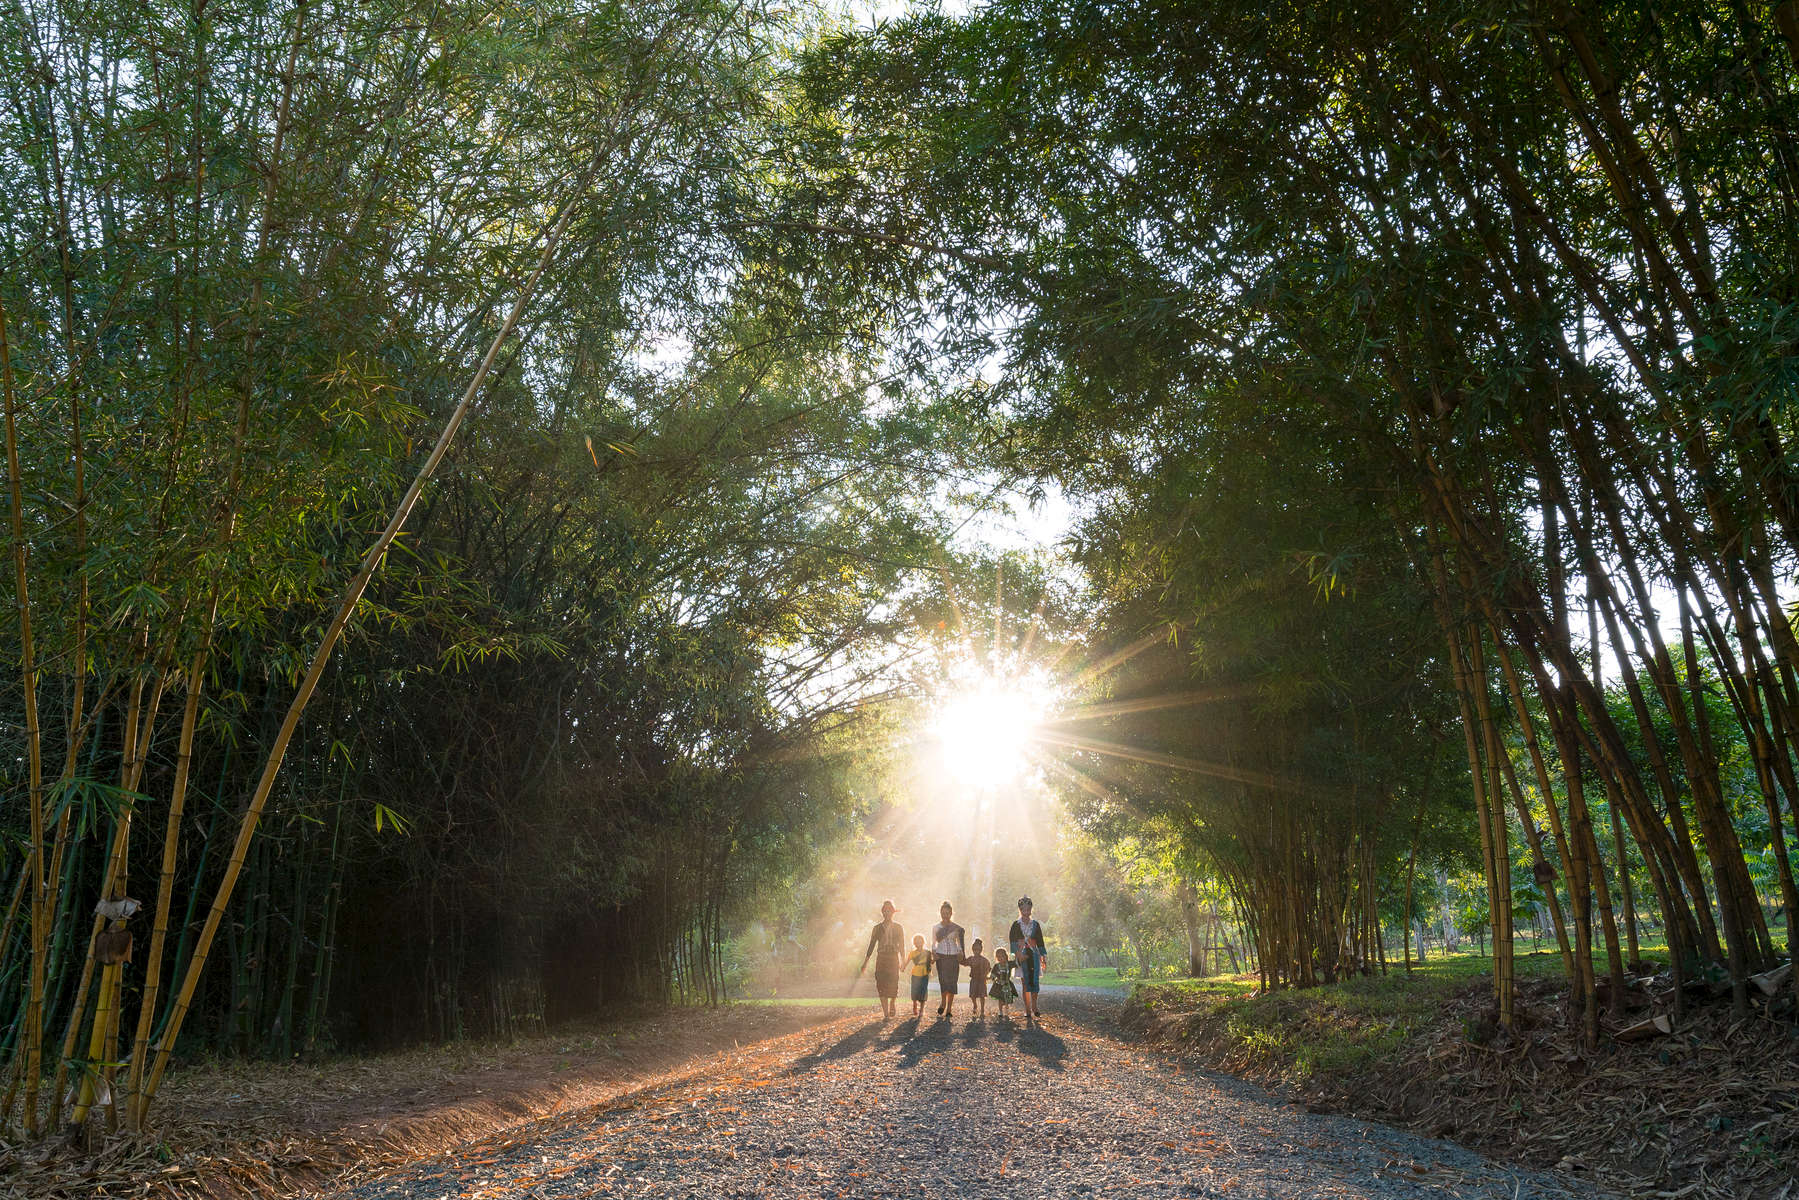 Laos-Luang-Prabang-Pha-Tad-Khe-Botanical-Garden-Photo-by-Cyril-Eberle-DSC05070